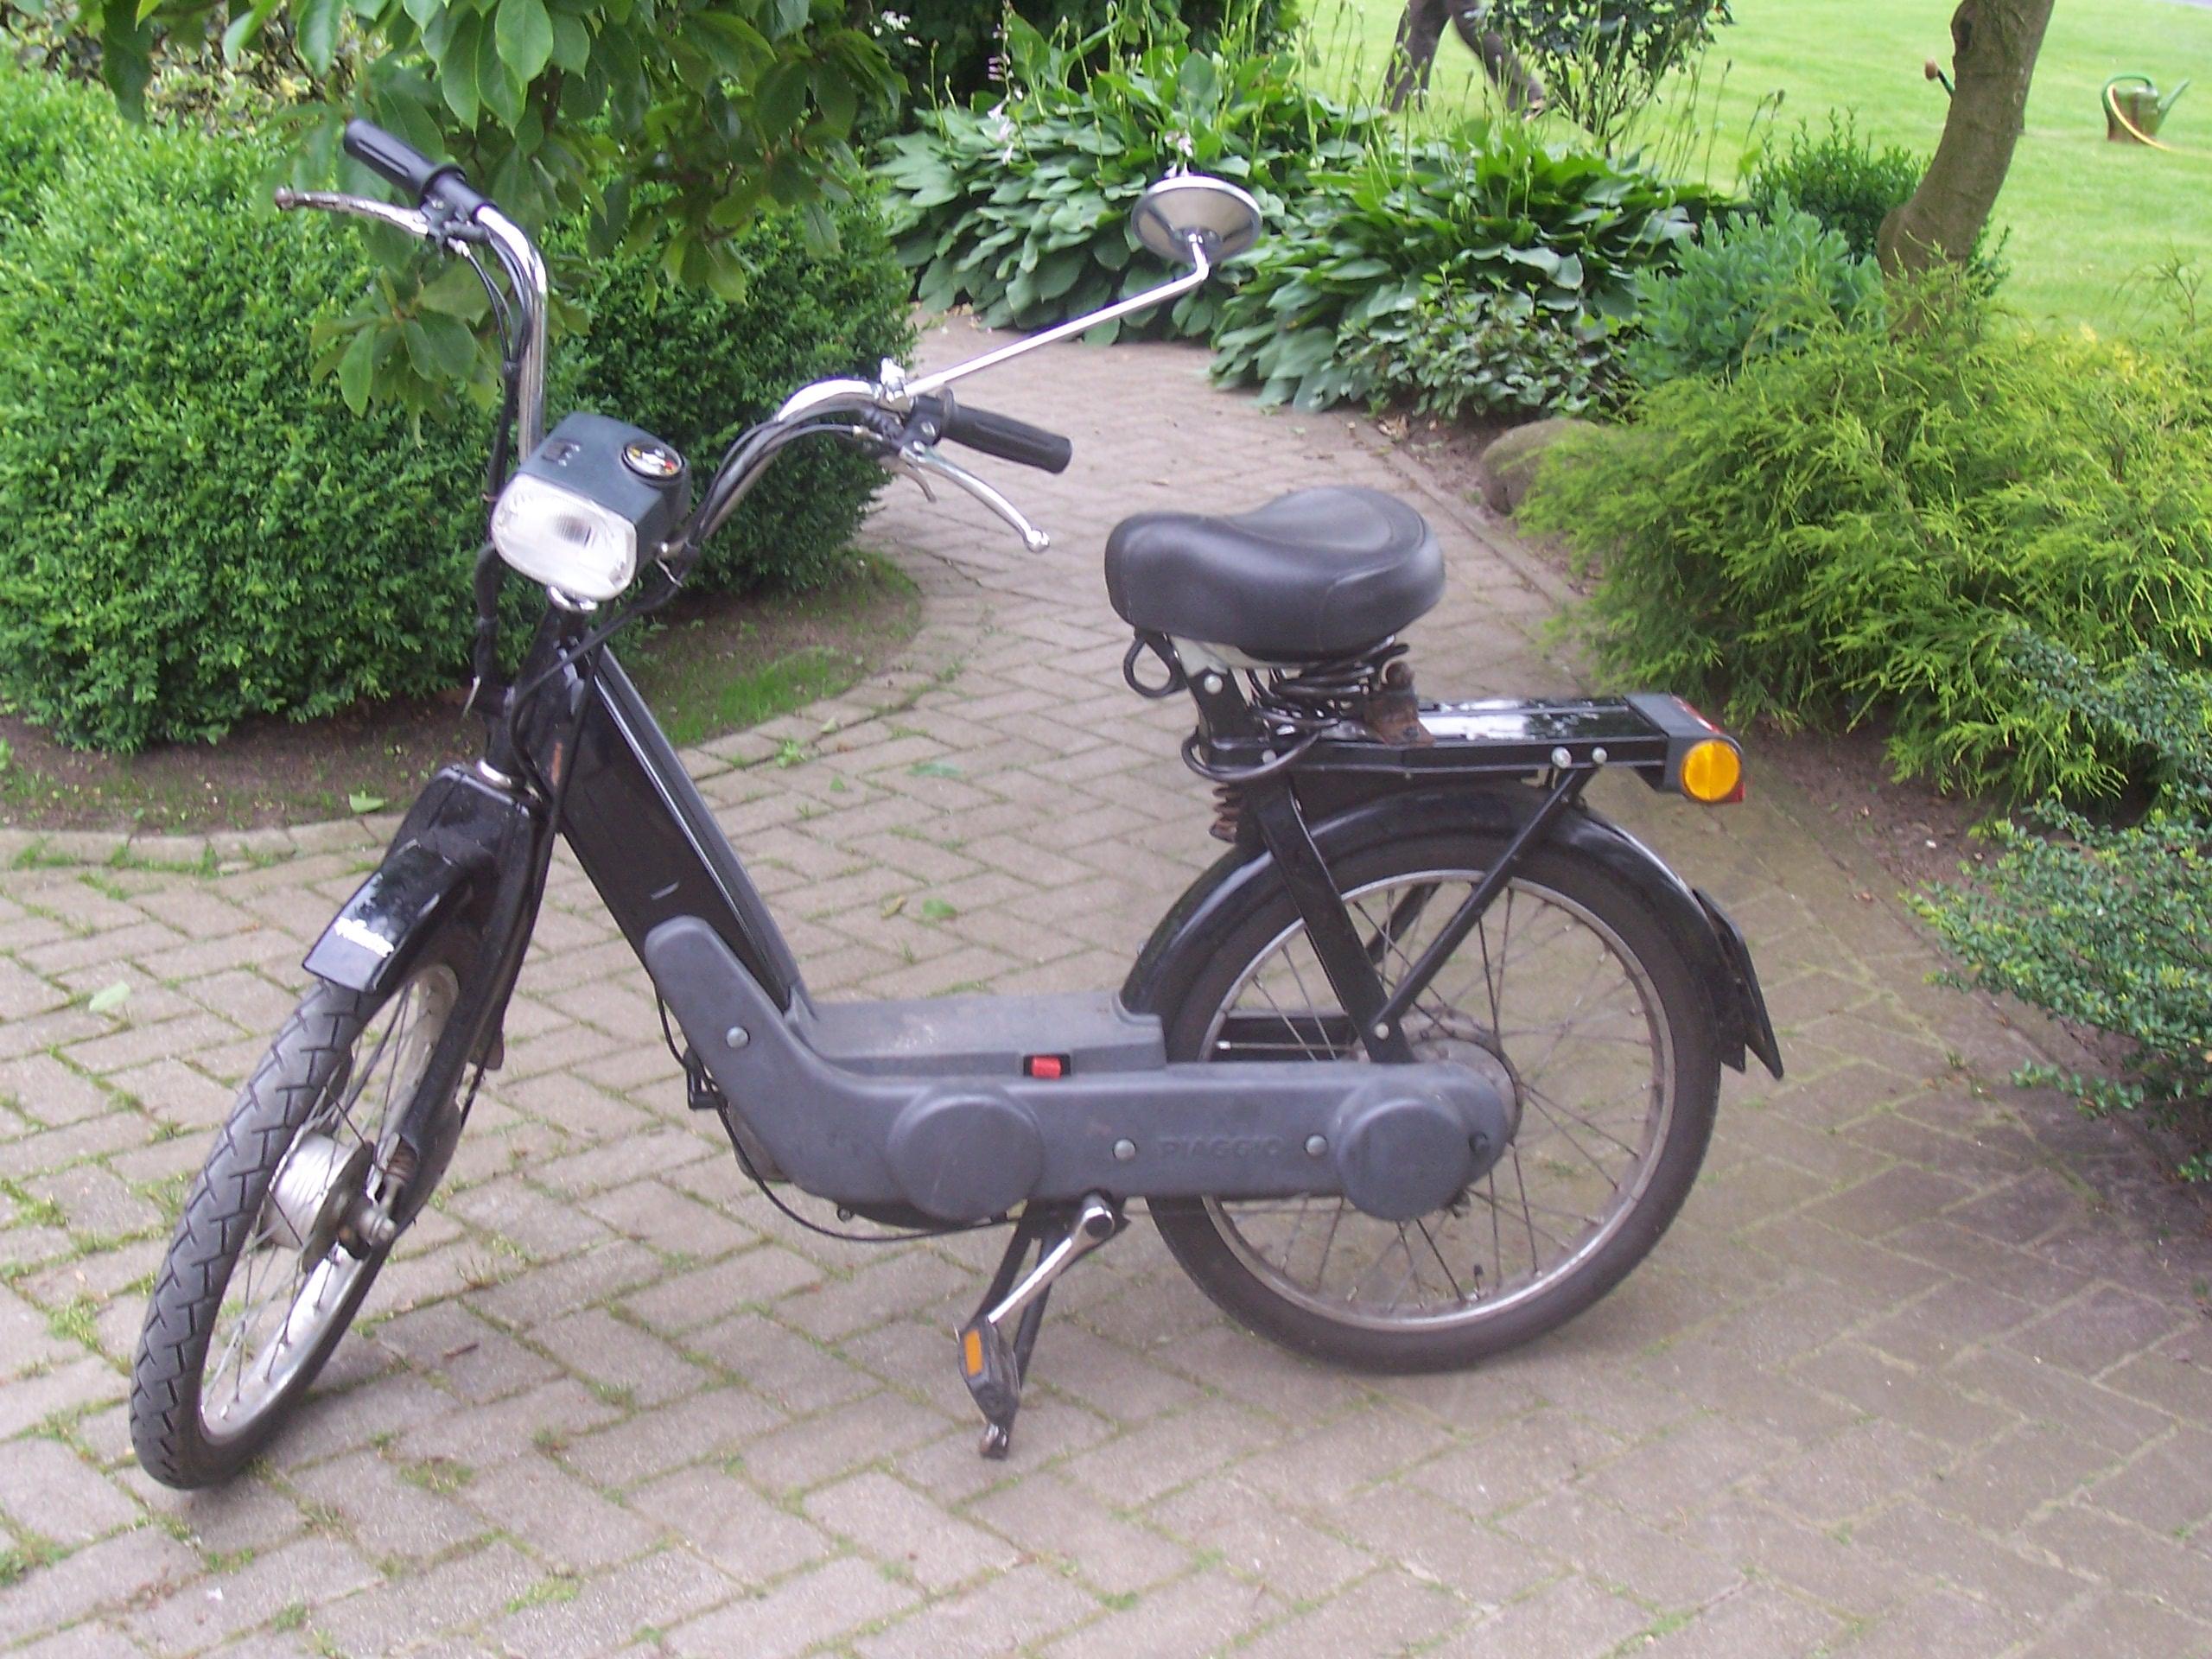 Piaggio Ciao Moped PXV 40 km/h ab Werk in Nordrhein